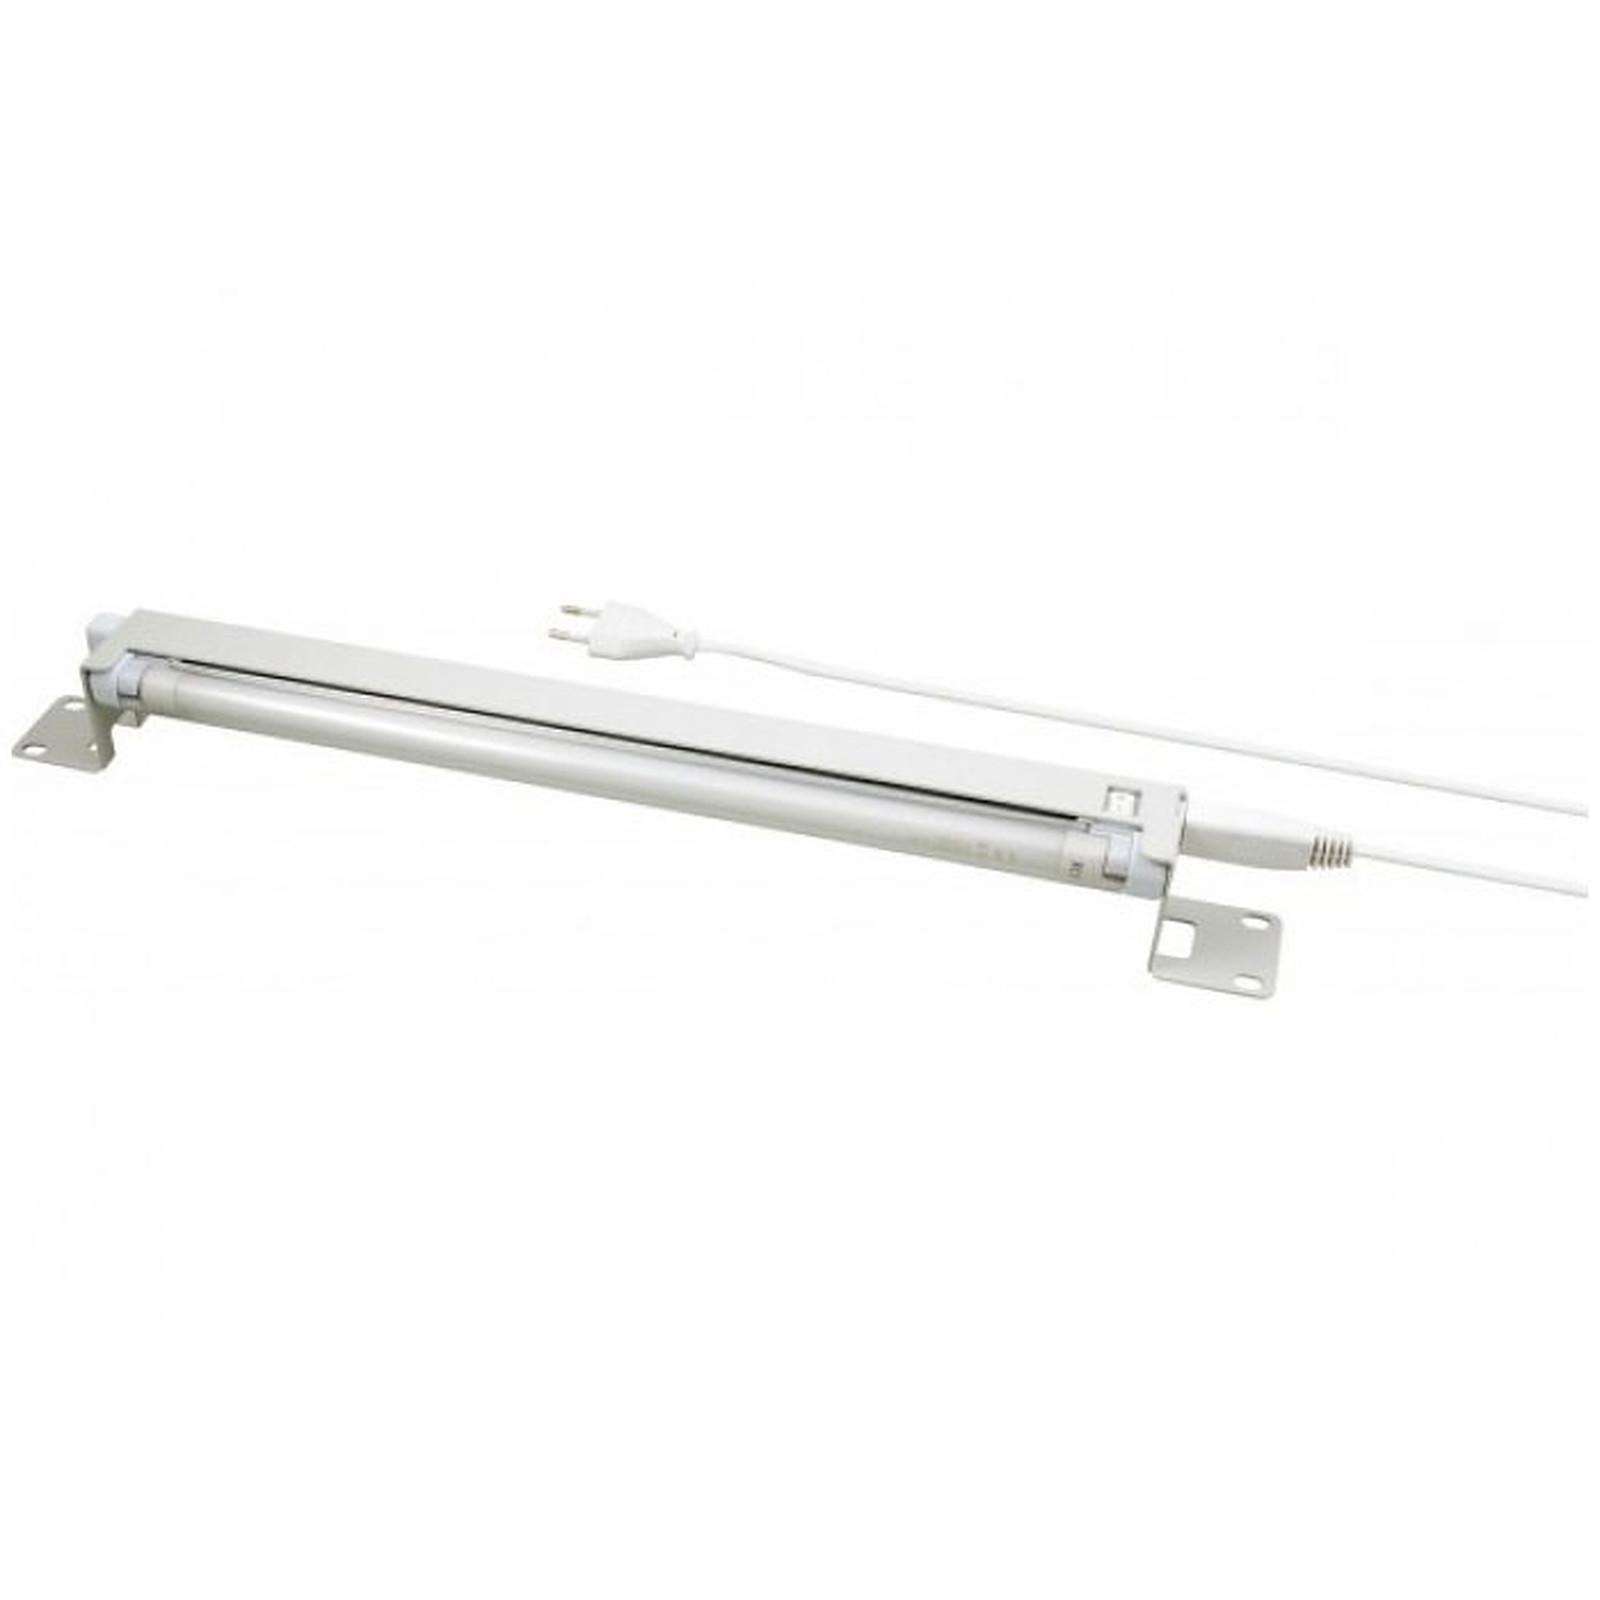 "Lampe rackable - longueur 19"" - hauteur 1U - 4000K"